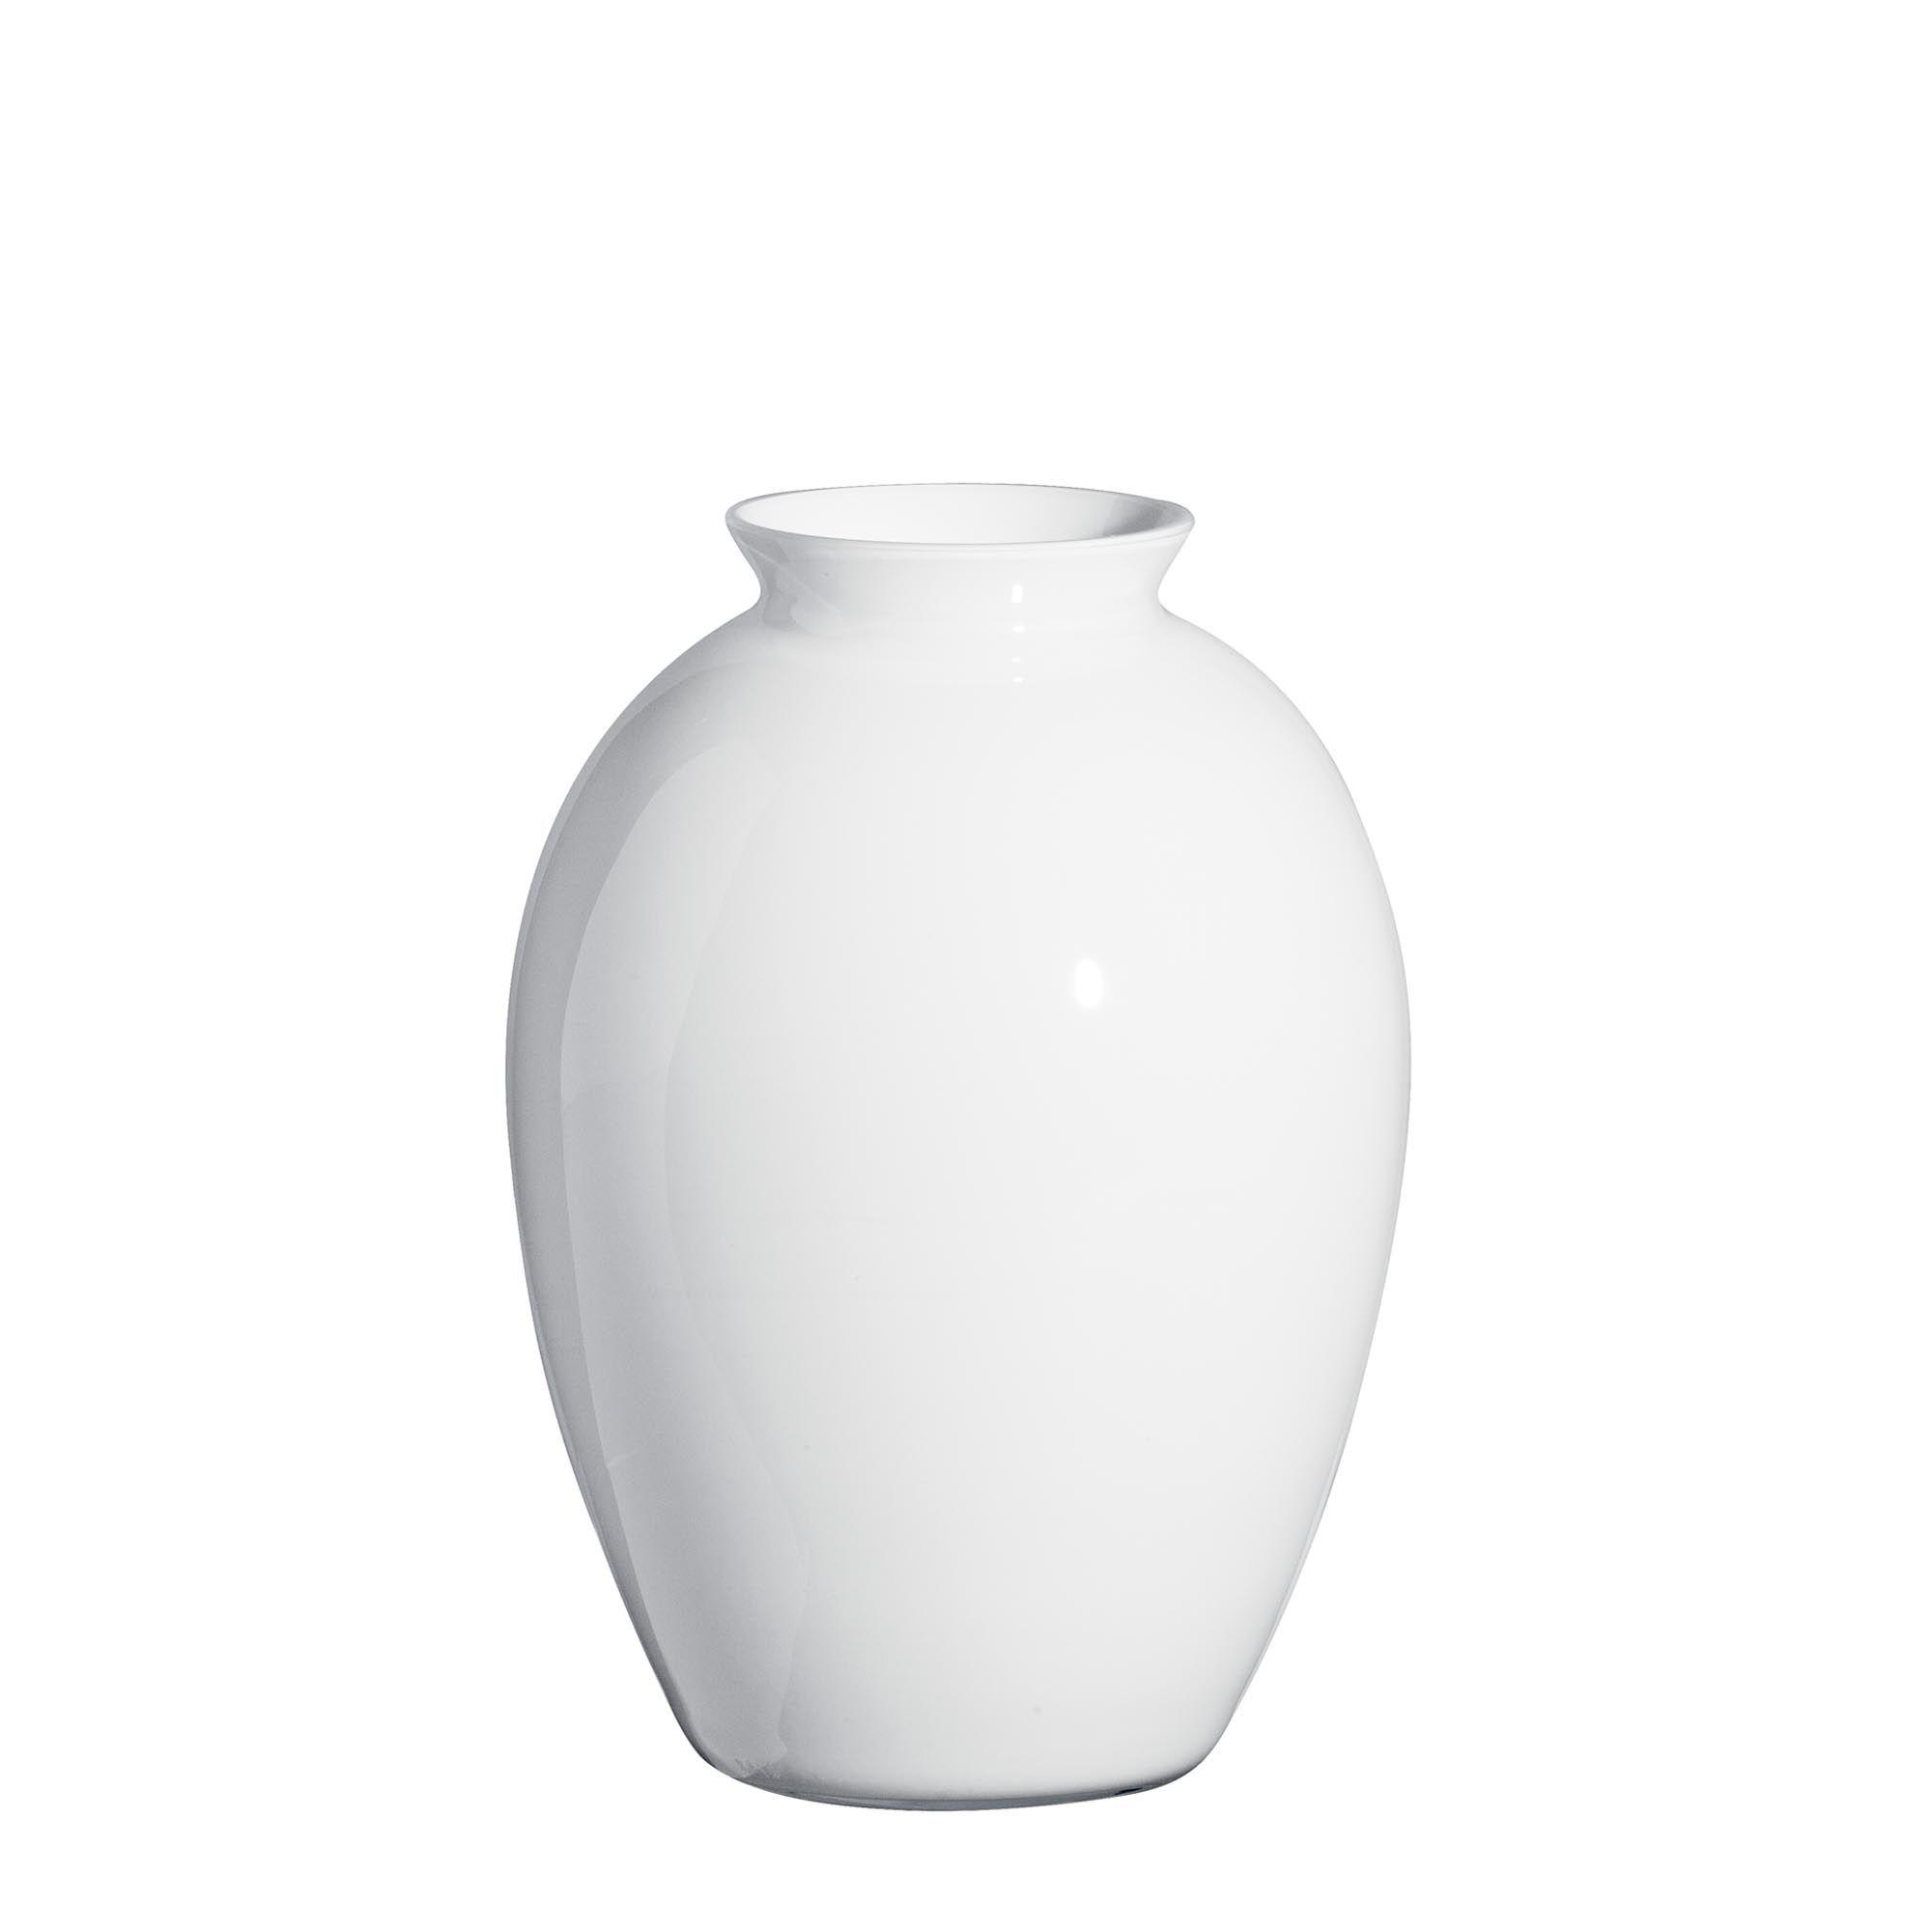 "Vase ""Pirus Lopas"" - Modell 975.F.LA - Größe Large - Carlo Moretti - Murano Glas"